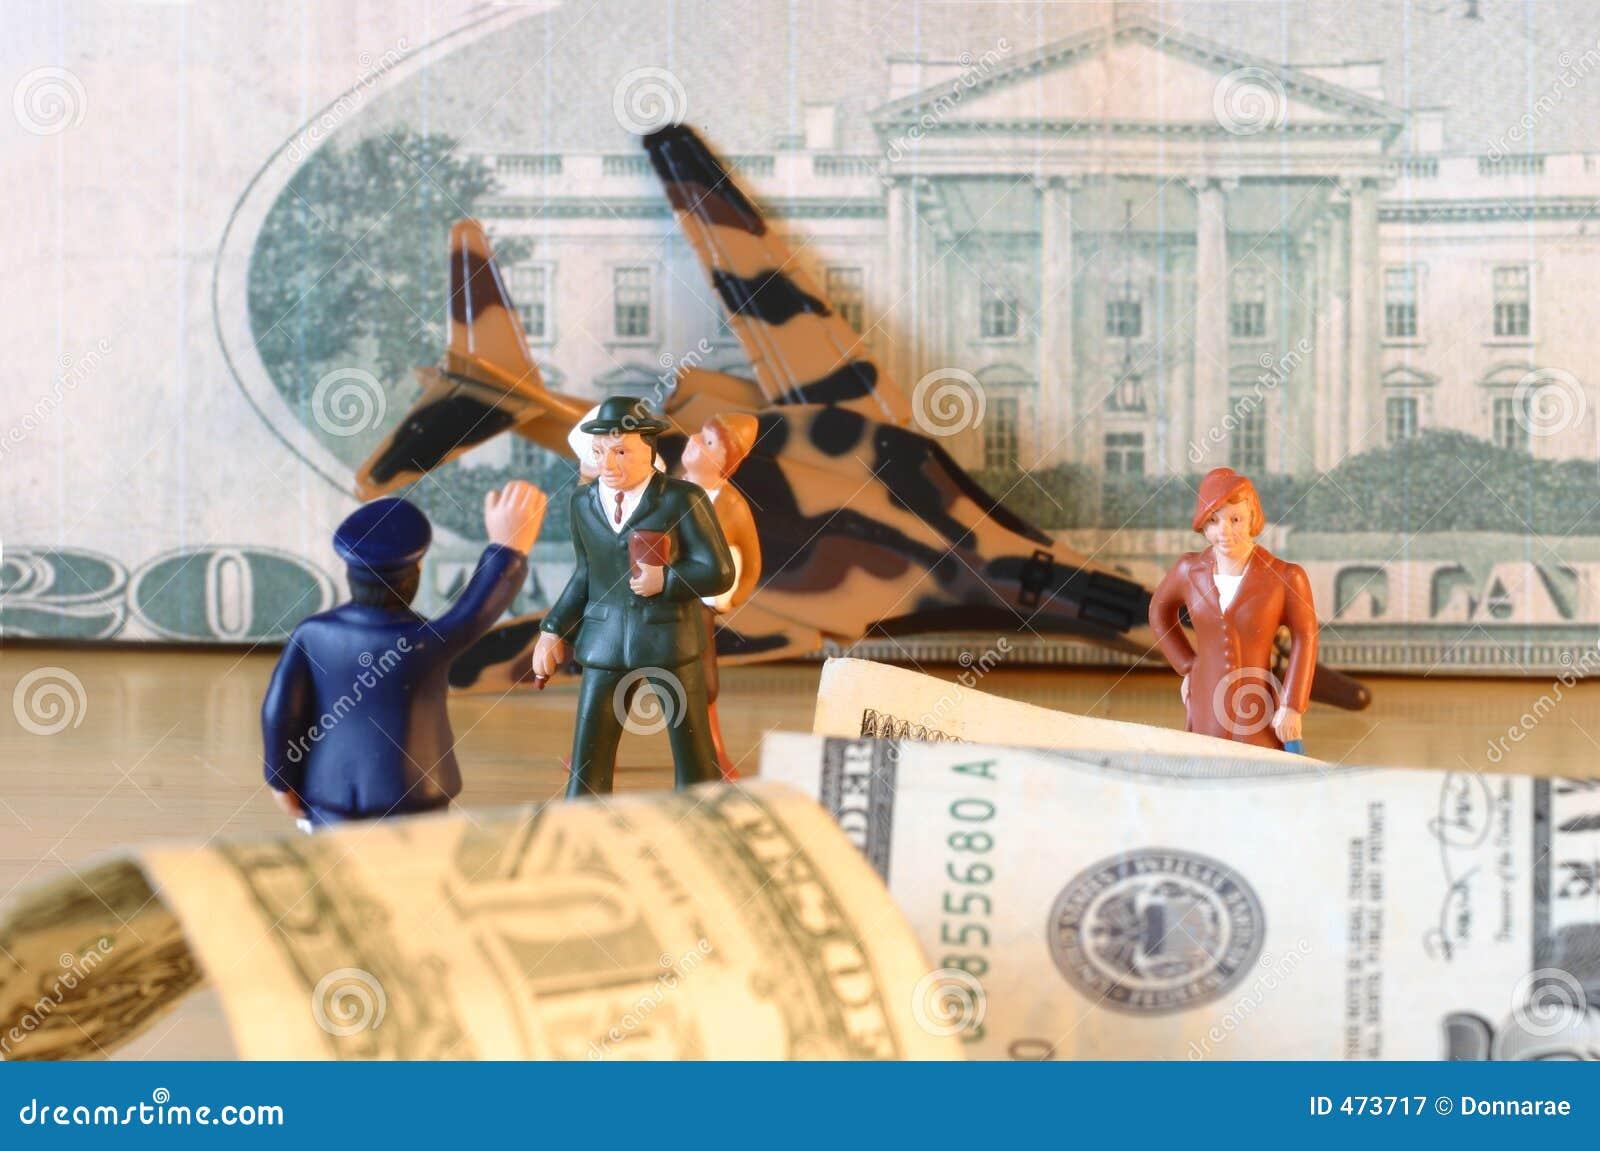 Crash, dollars, finance, confusion & loss